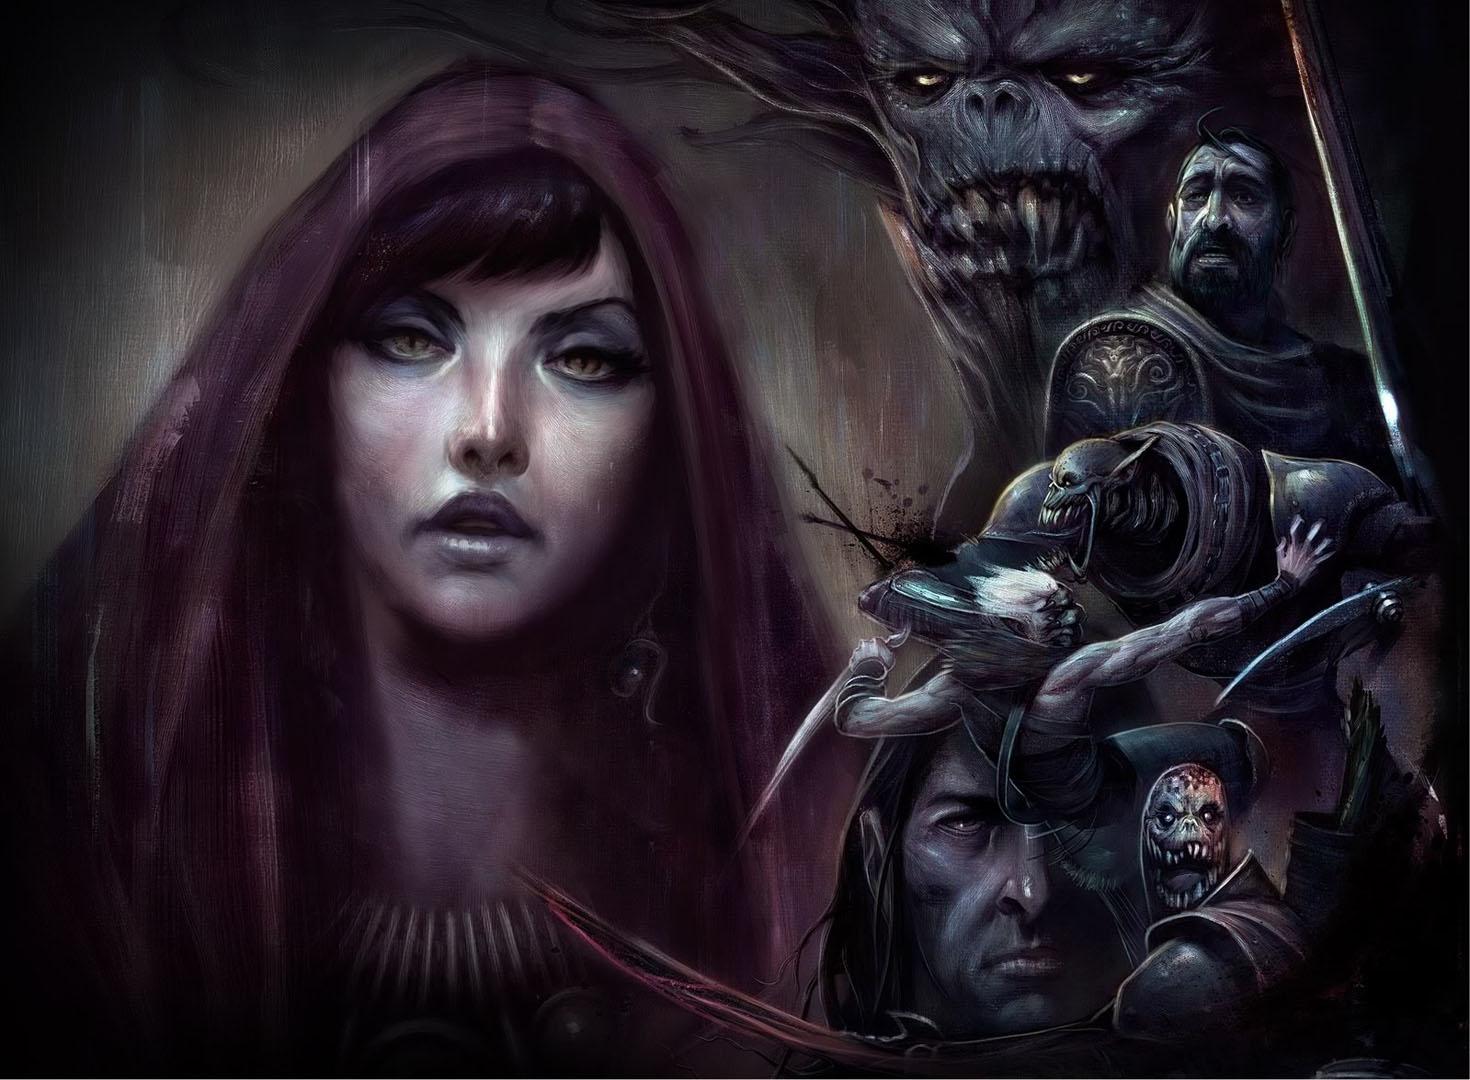 Morrigan The Dark Mage - Dragon Age Wallpaper